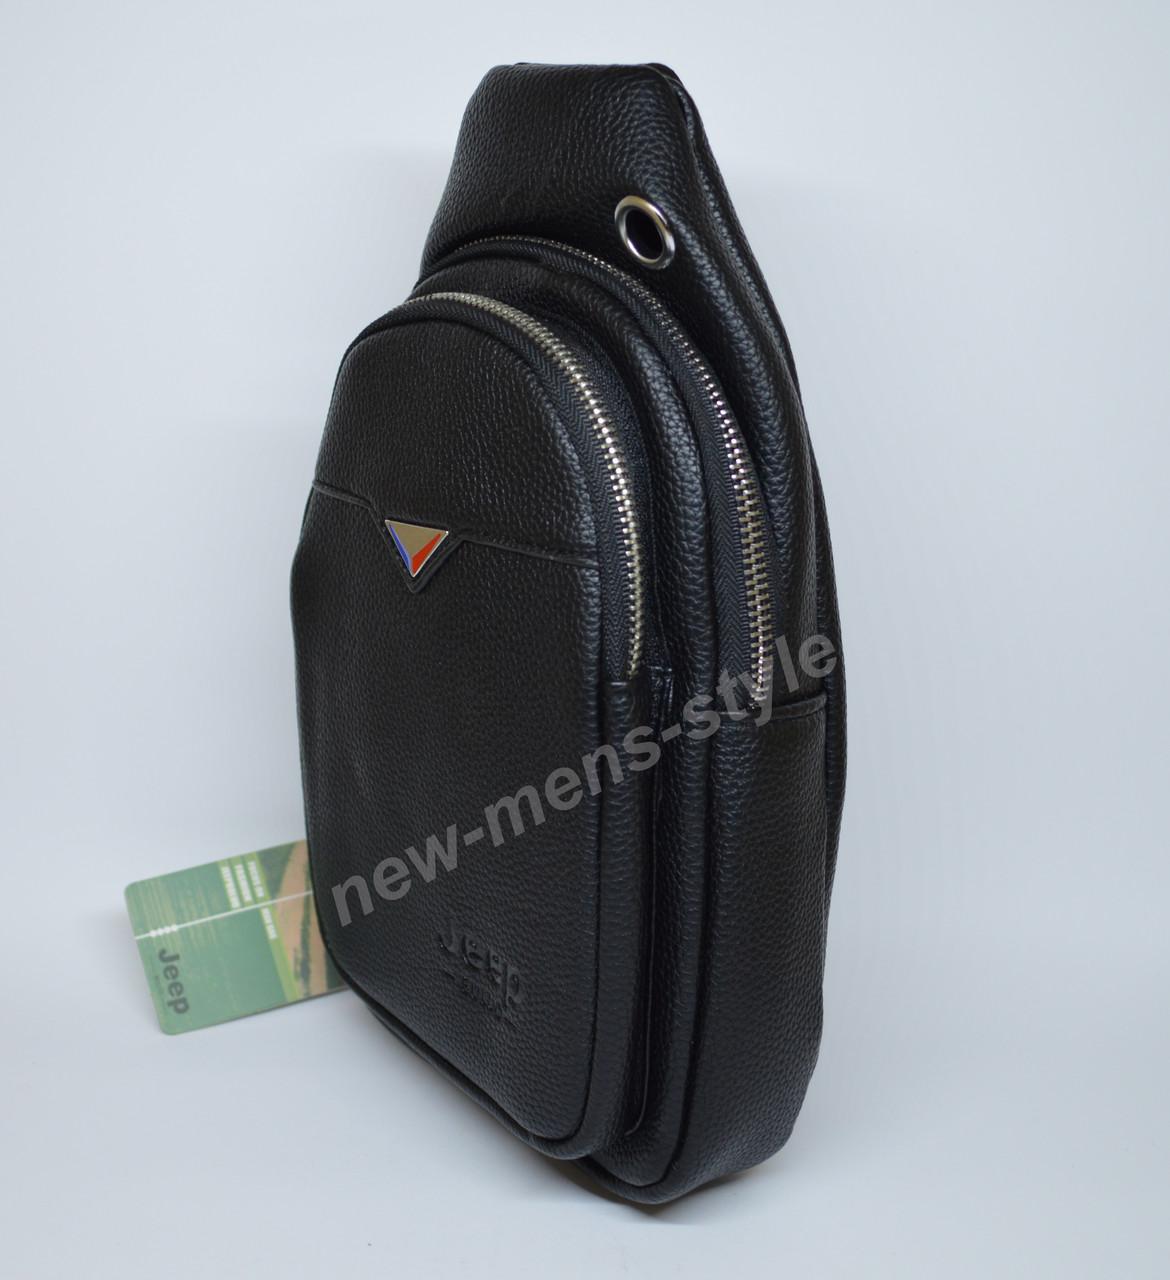 e8fb9f7e1048 ... Мужская спортивная кожаная сумка слинг рюкзак бананка Jeep BULUO 3 ...